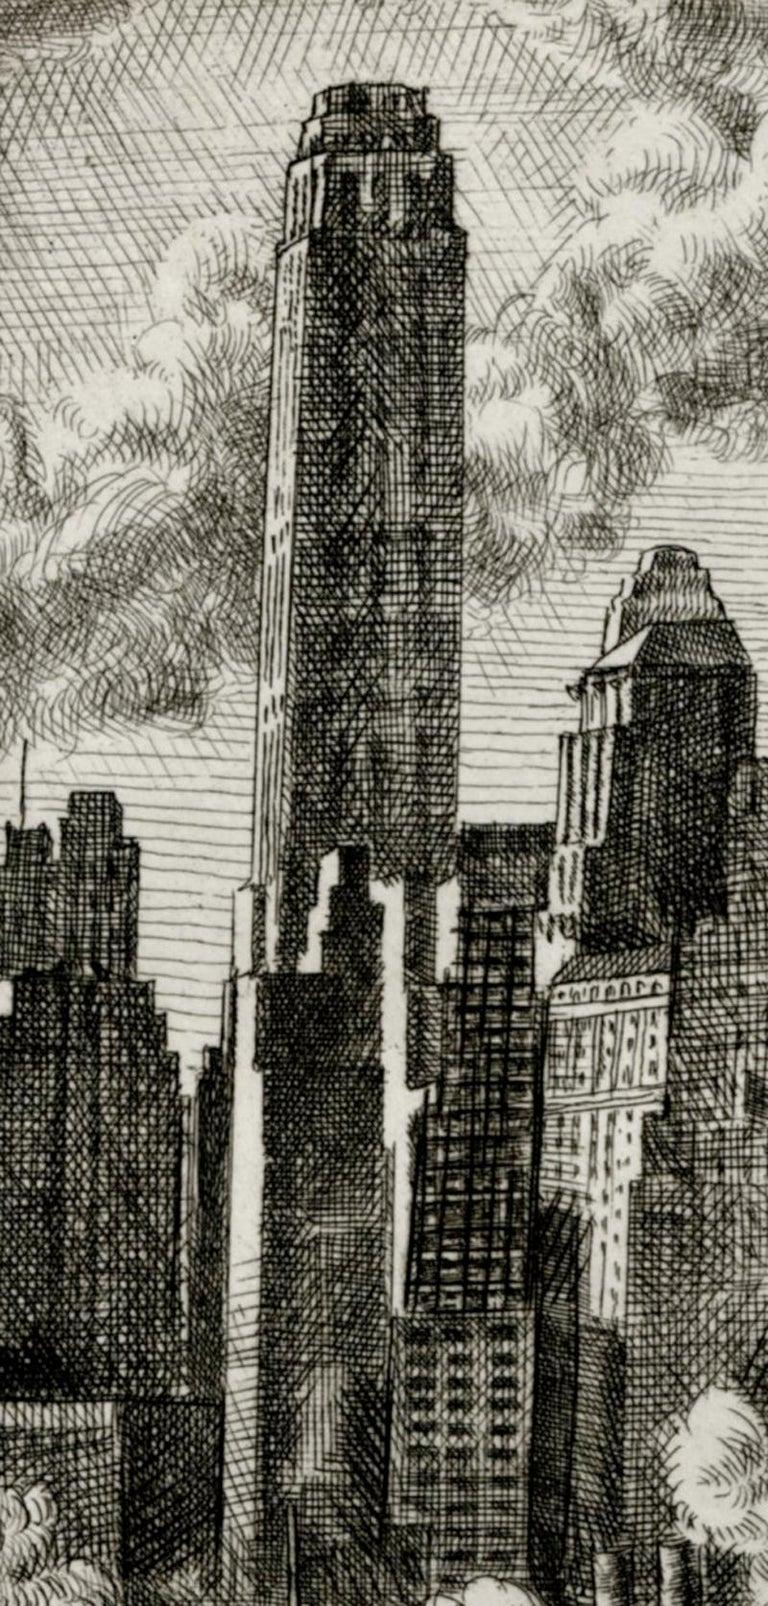 Wall Street - Black Landscape Print by Reginald Marsh